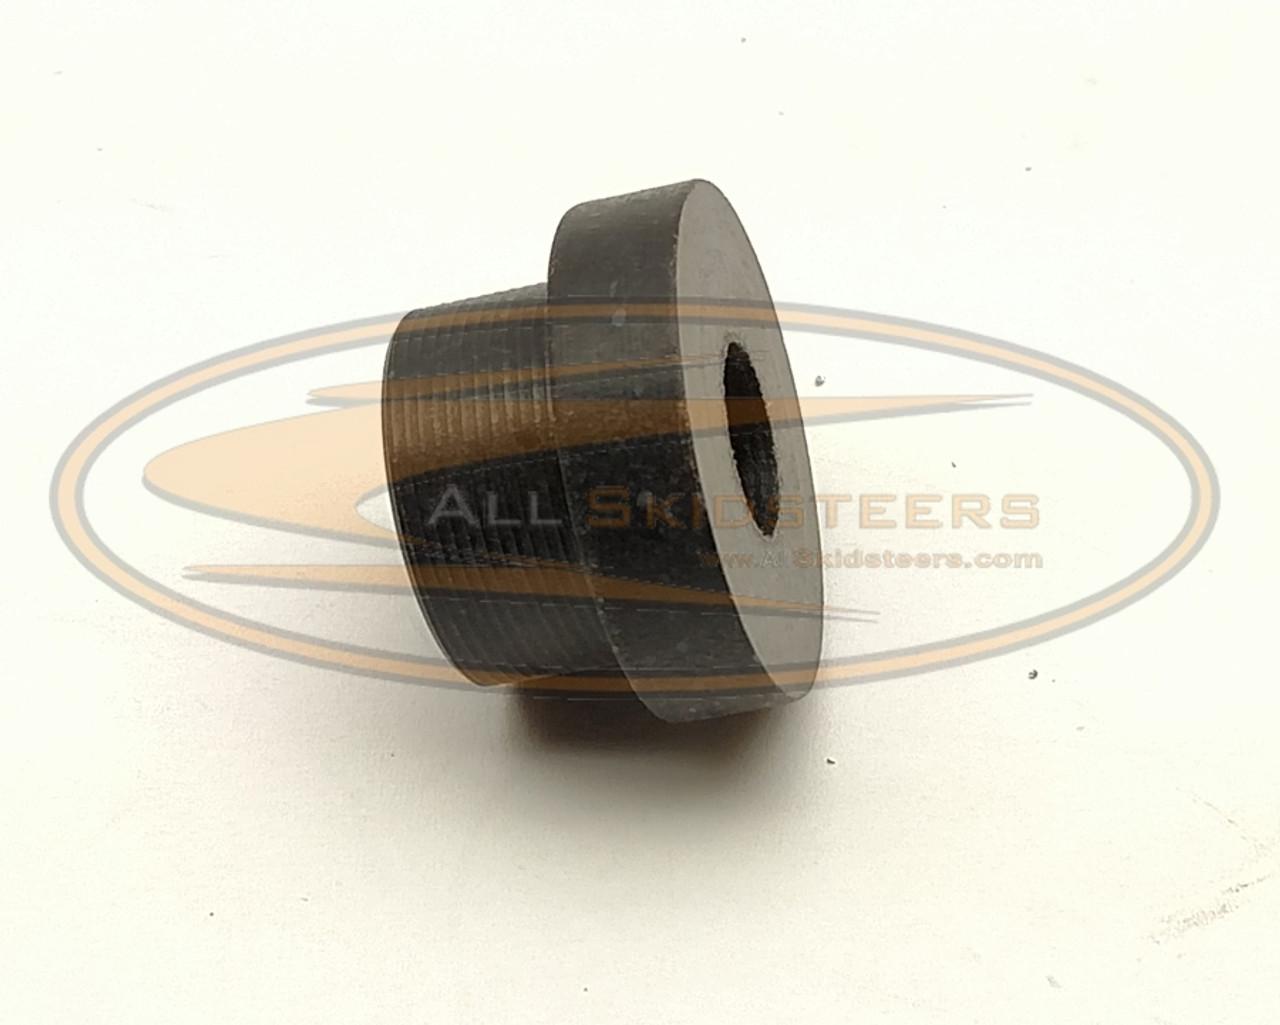 Seat Bar Sensor for Bobcat Skid Steer fits T110 T140 S530 S550 ...